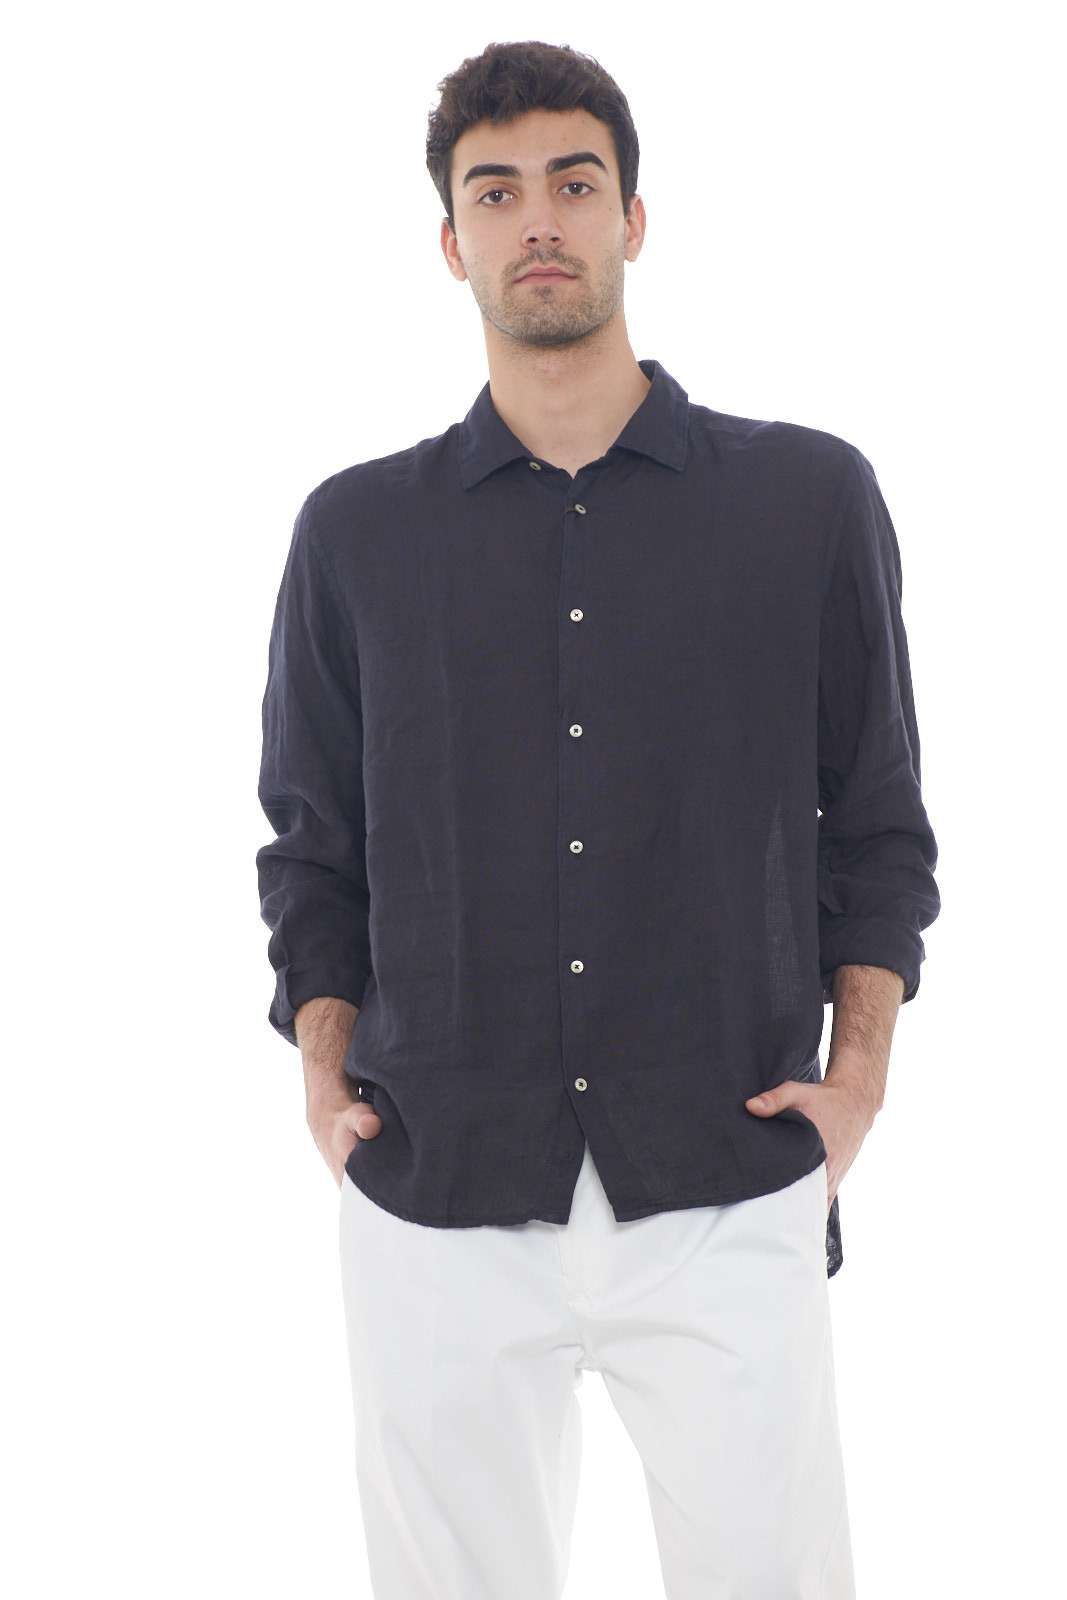 https://www.parmax.com/media/catalog/product/a/i/PE-outlet_parmax-camicia-uomo-Altea-1954000-A_2.jpg